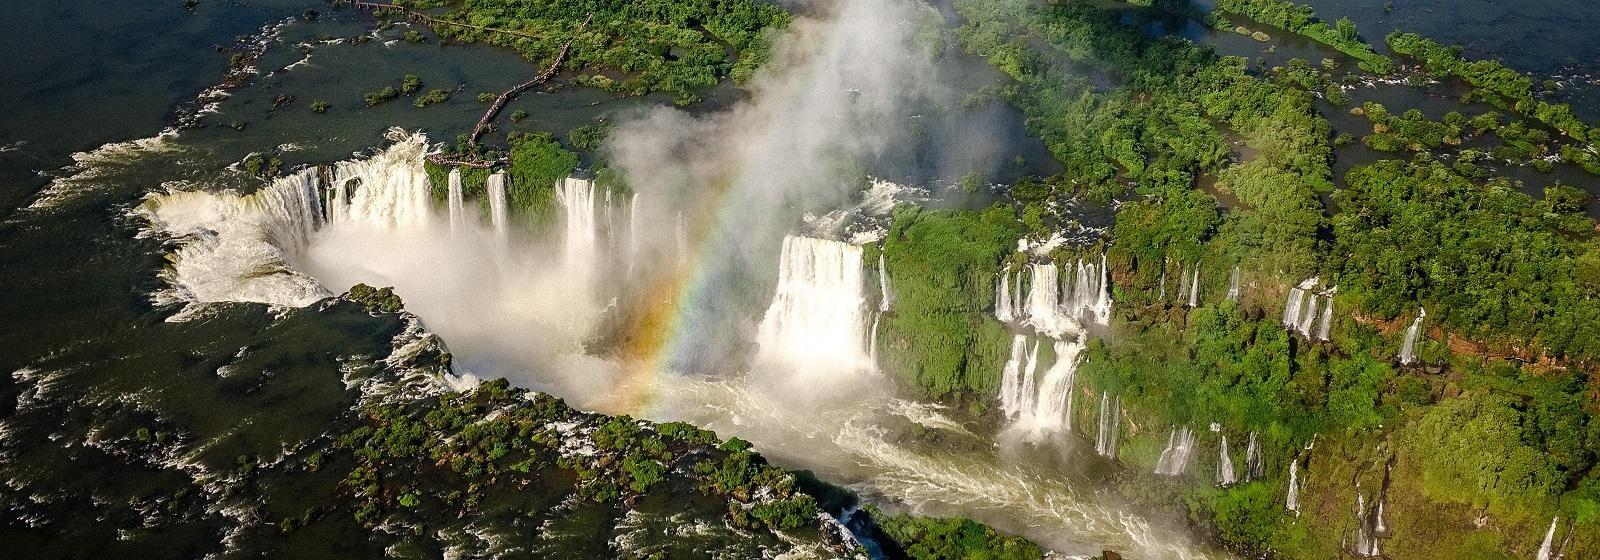 Things to do in Puerto Iguazu